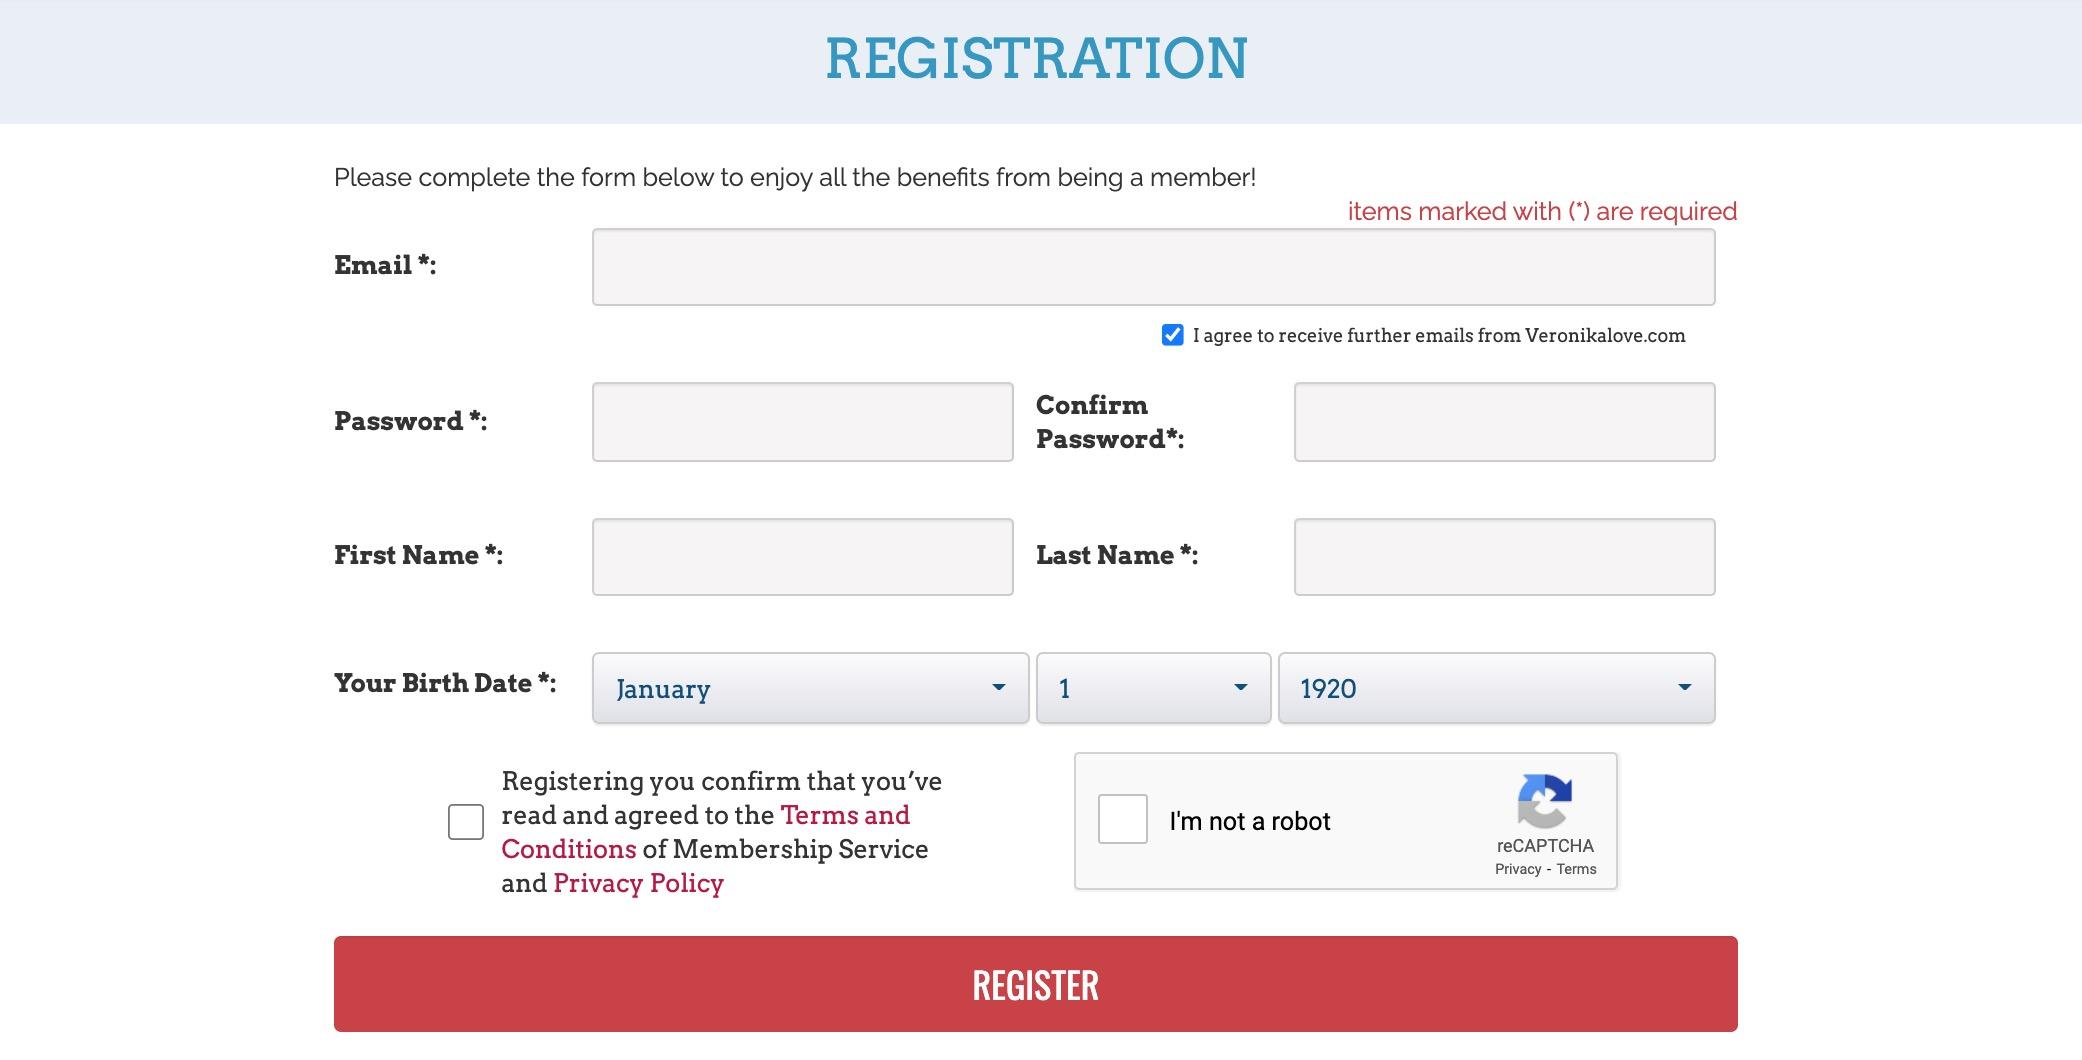 VeronikaLove registration